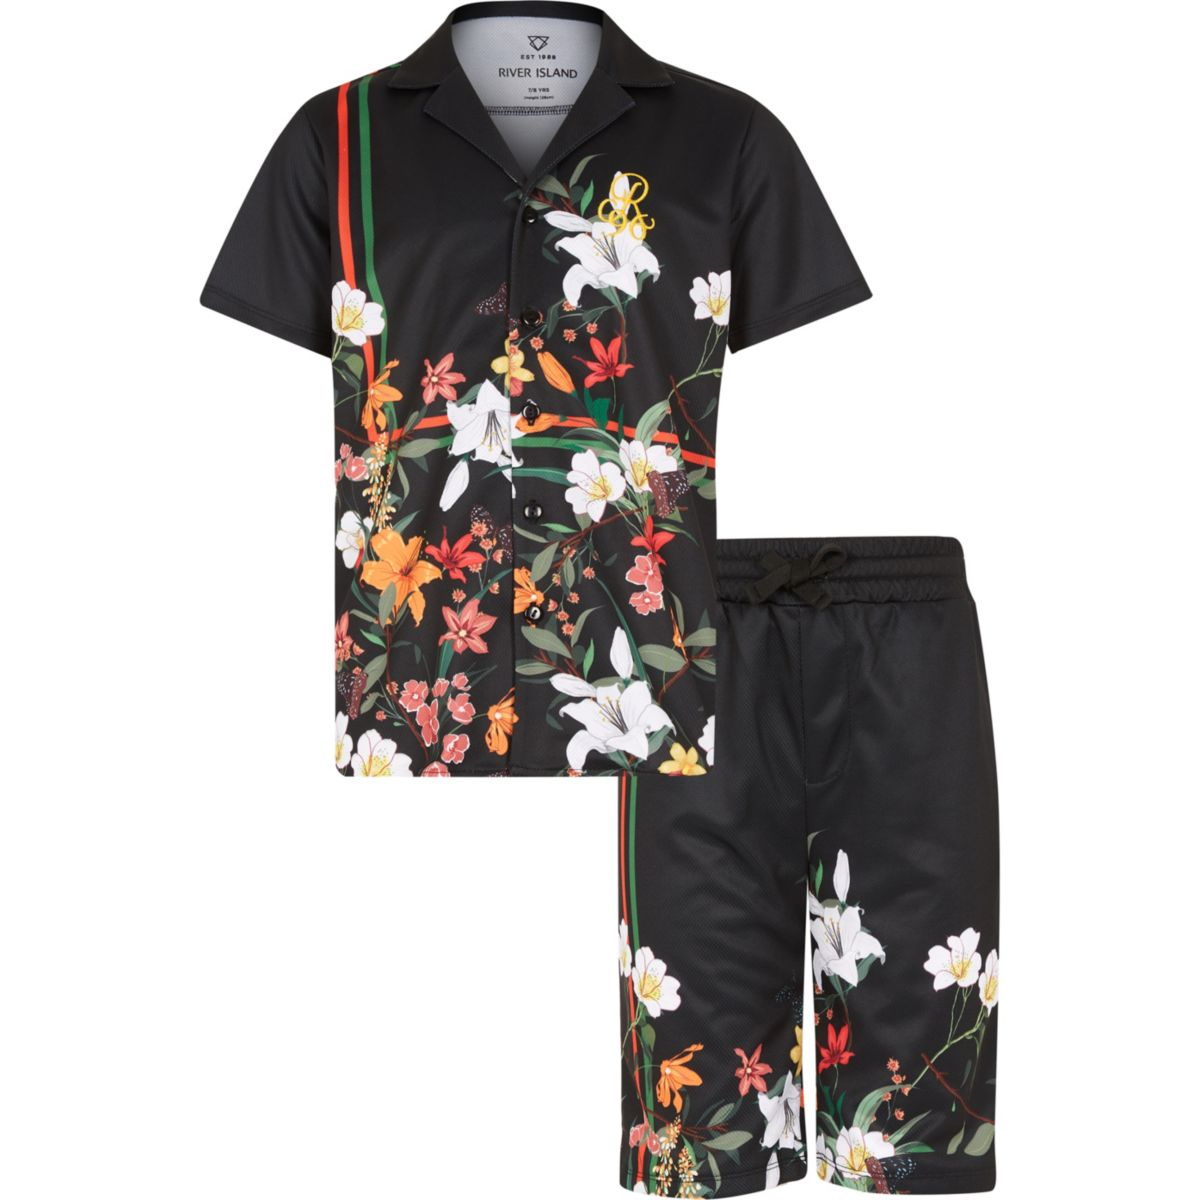 Boys black floral mesh shirt outfit